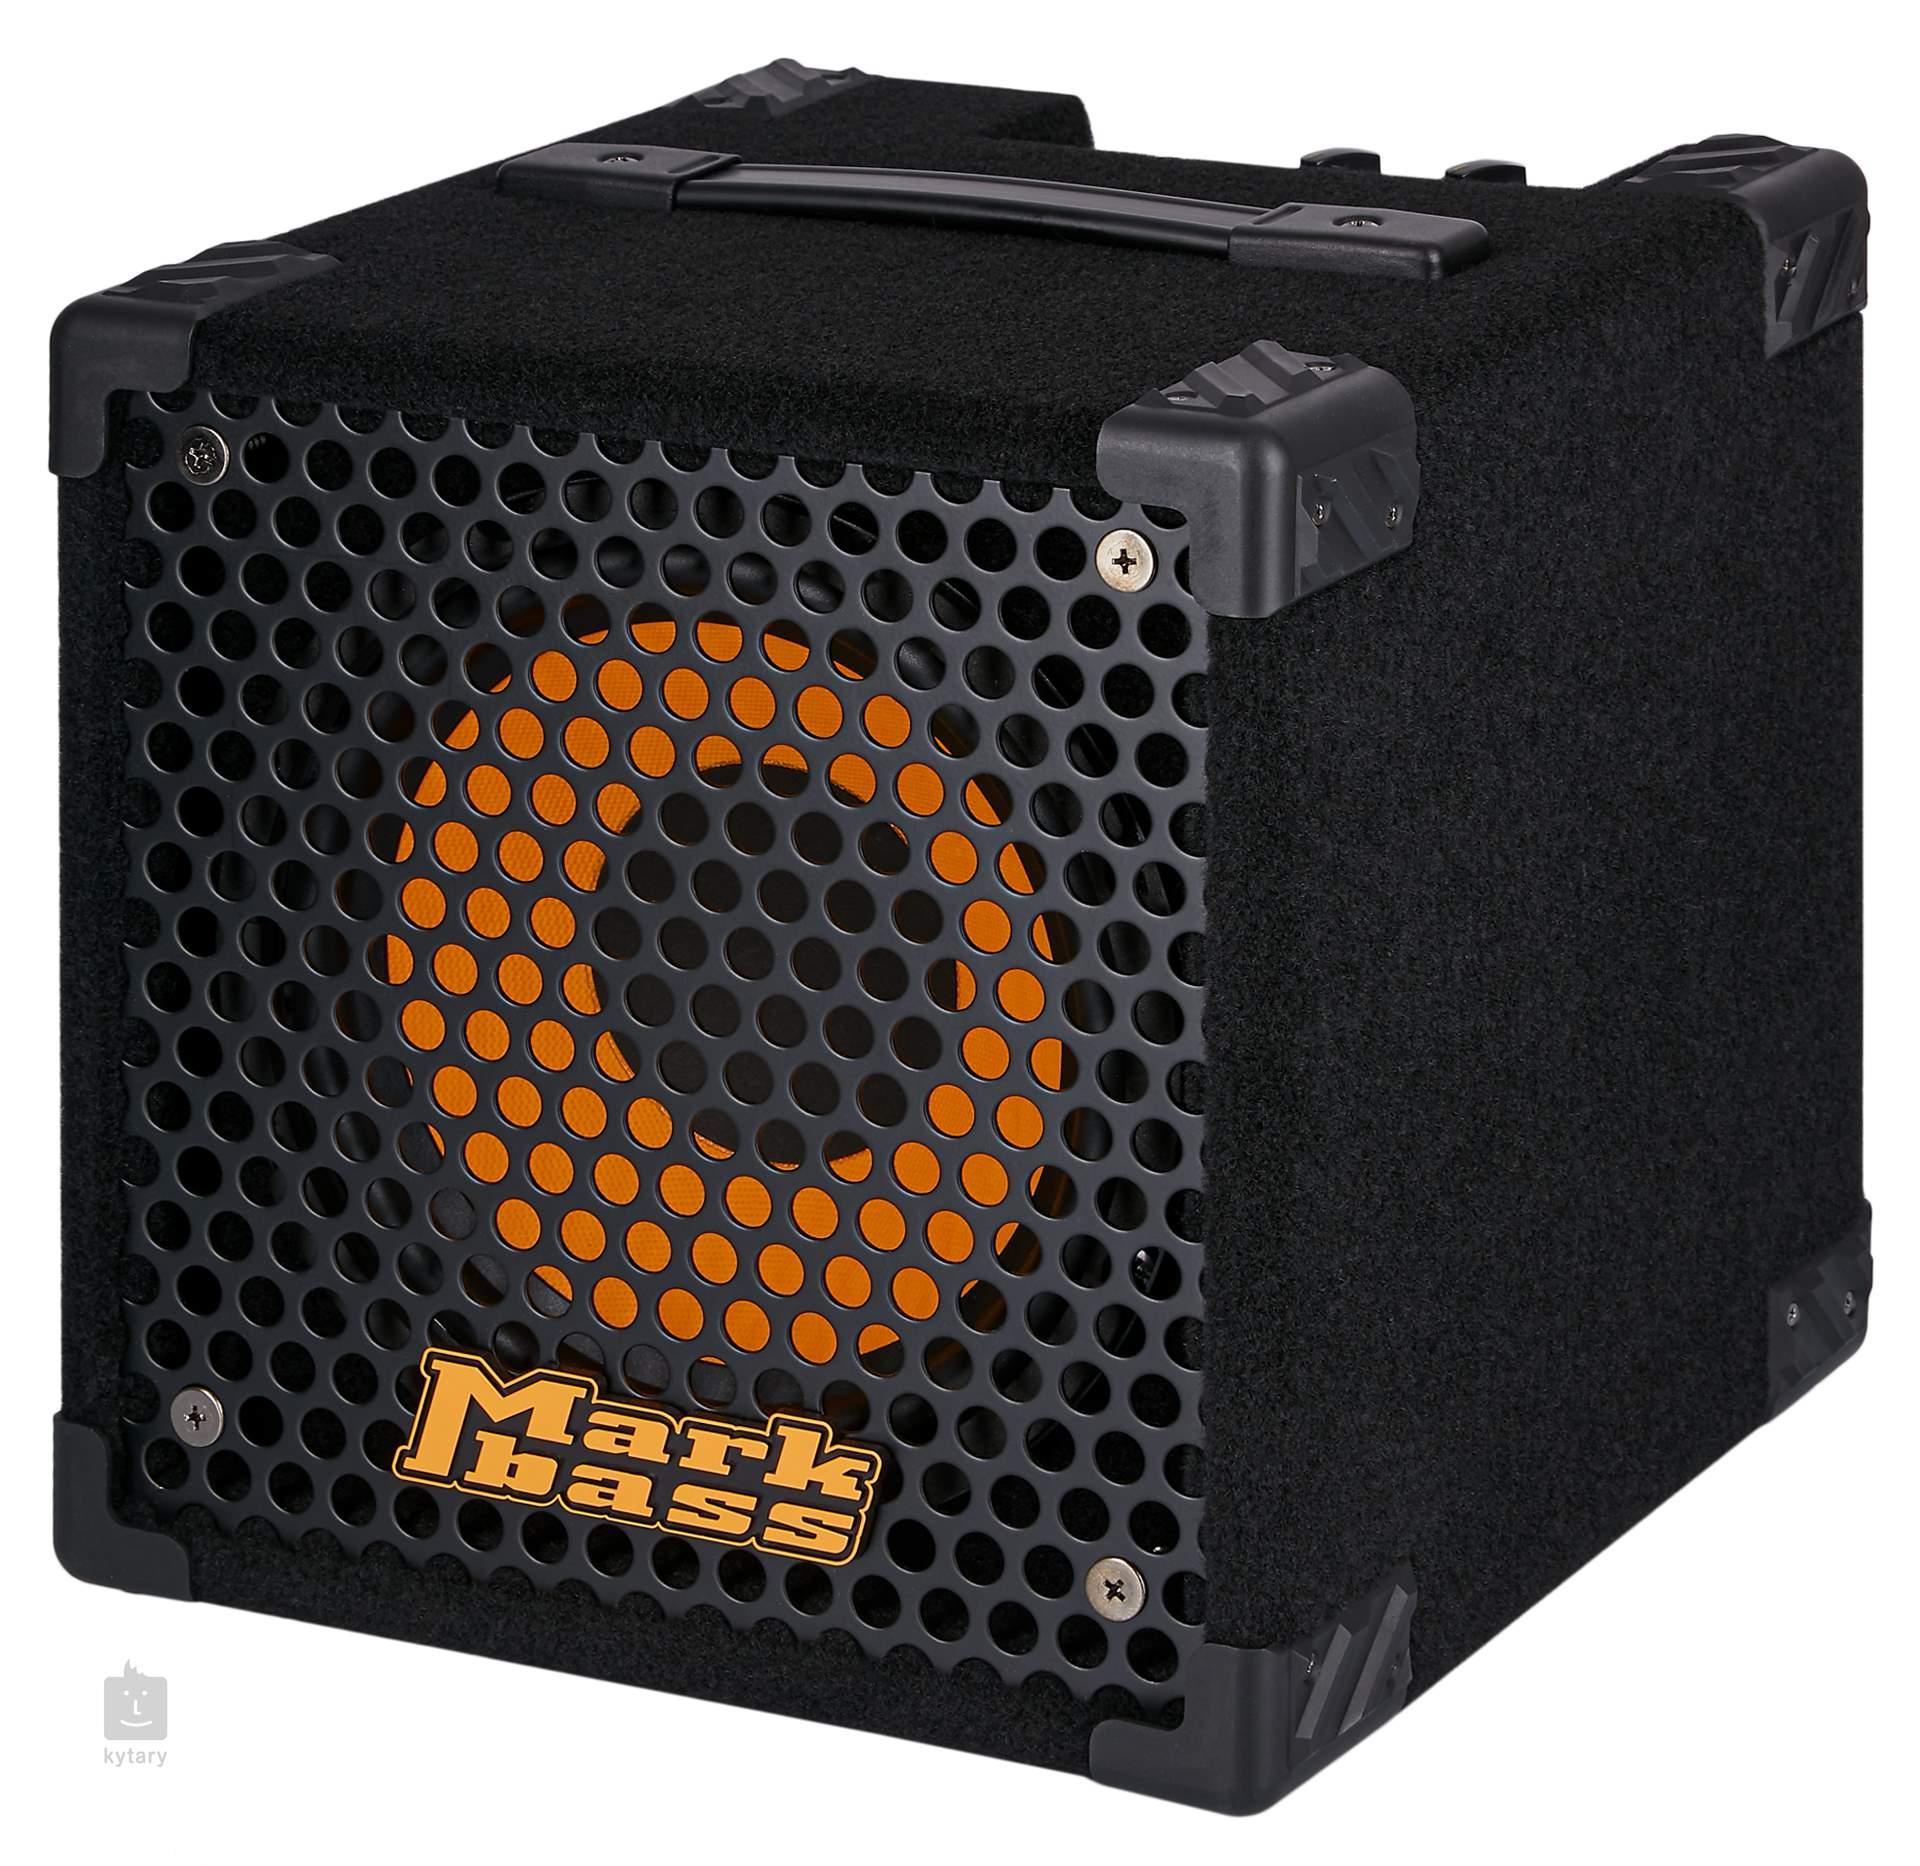 schwarz NJS verstellbarer Aluminium-Kurzständer für PA-Lautsprecher 35 mm NJS063A